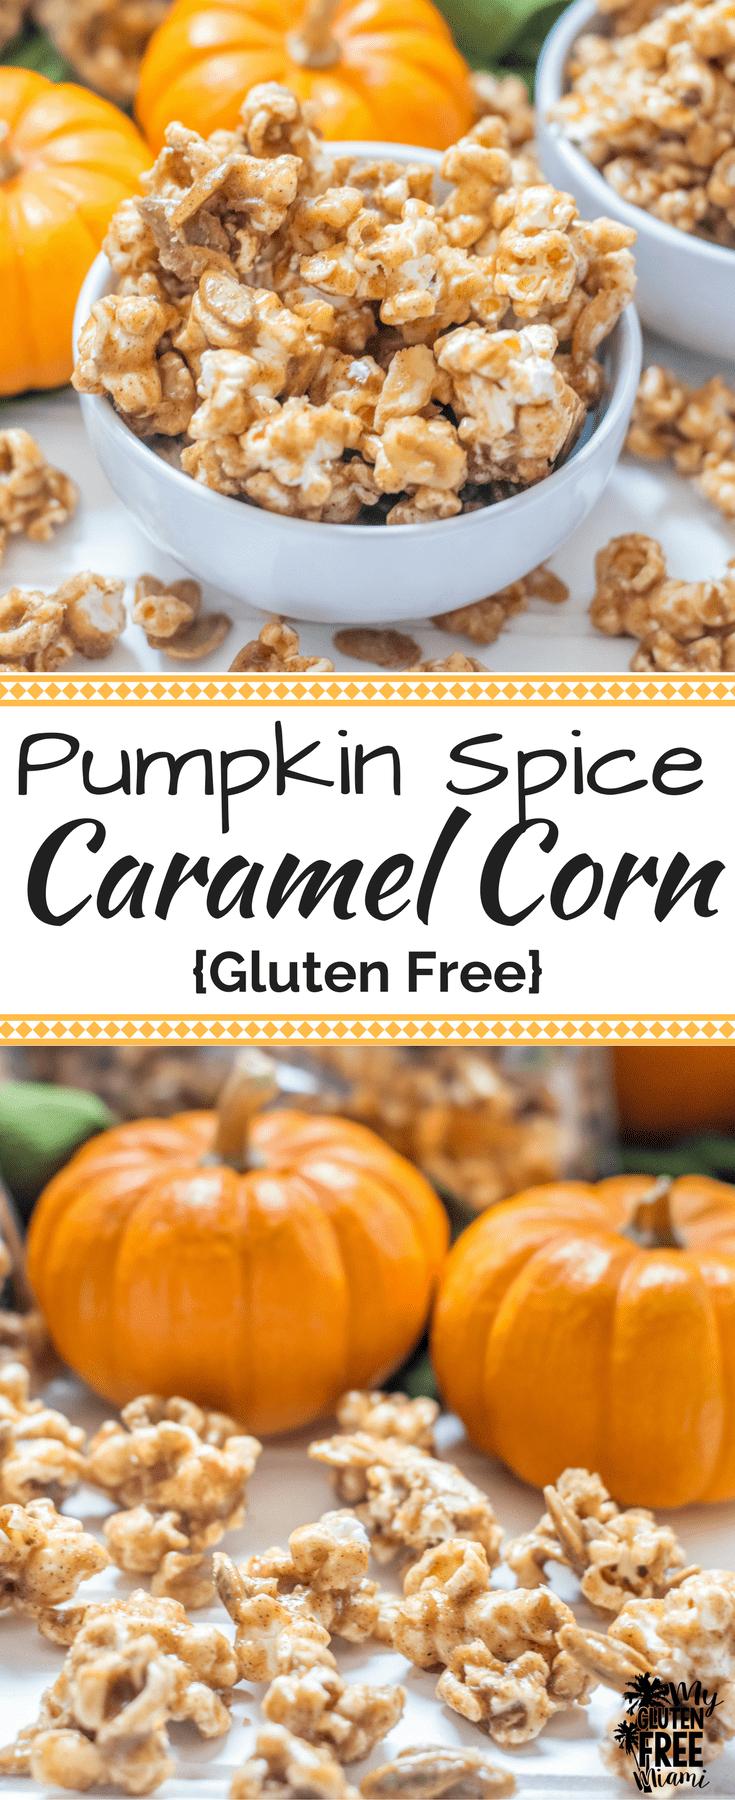 Pumpkin Spice Caramel Corn with Pumpkin Seeds and Walnuts